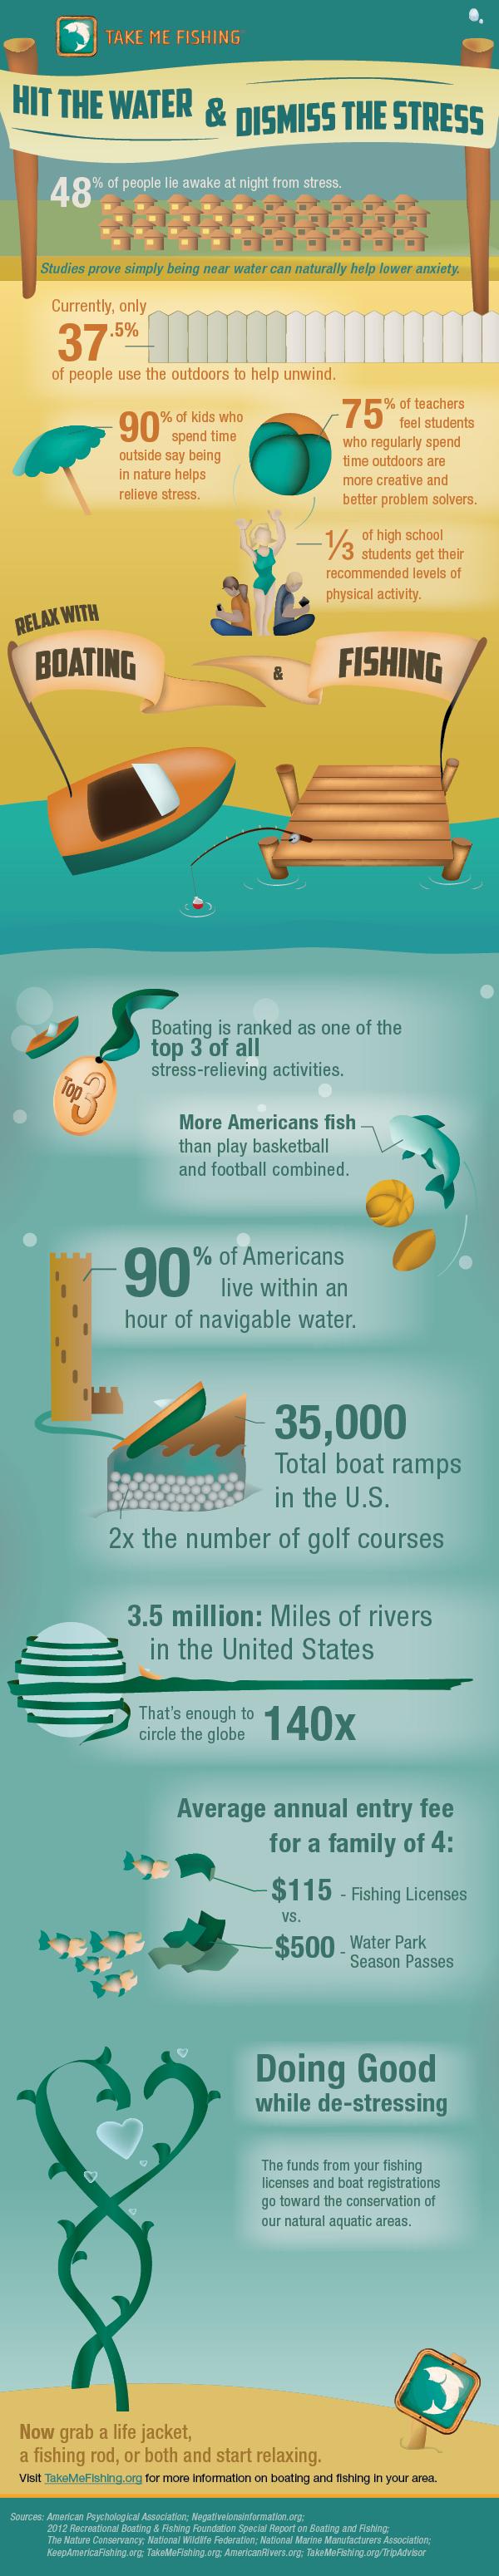 https://www.takemefishing.org/getmedia/e9916bdb-ba4d-4cb2-a0d9-b3708d10d5c6/RBFF_Infographic.jpg.aspx